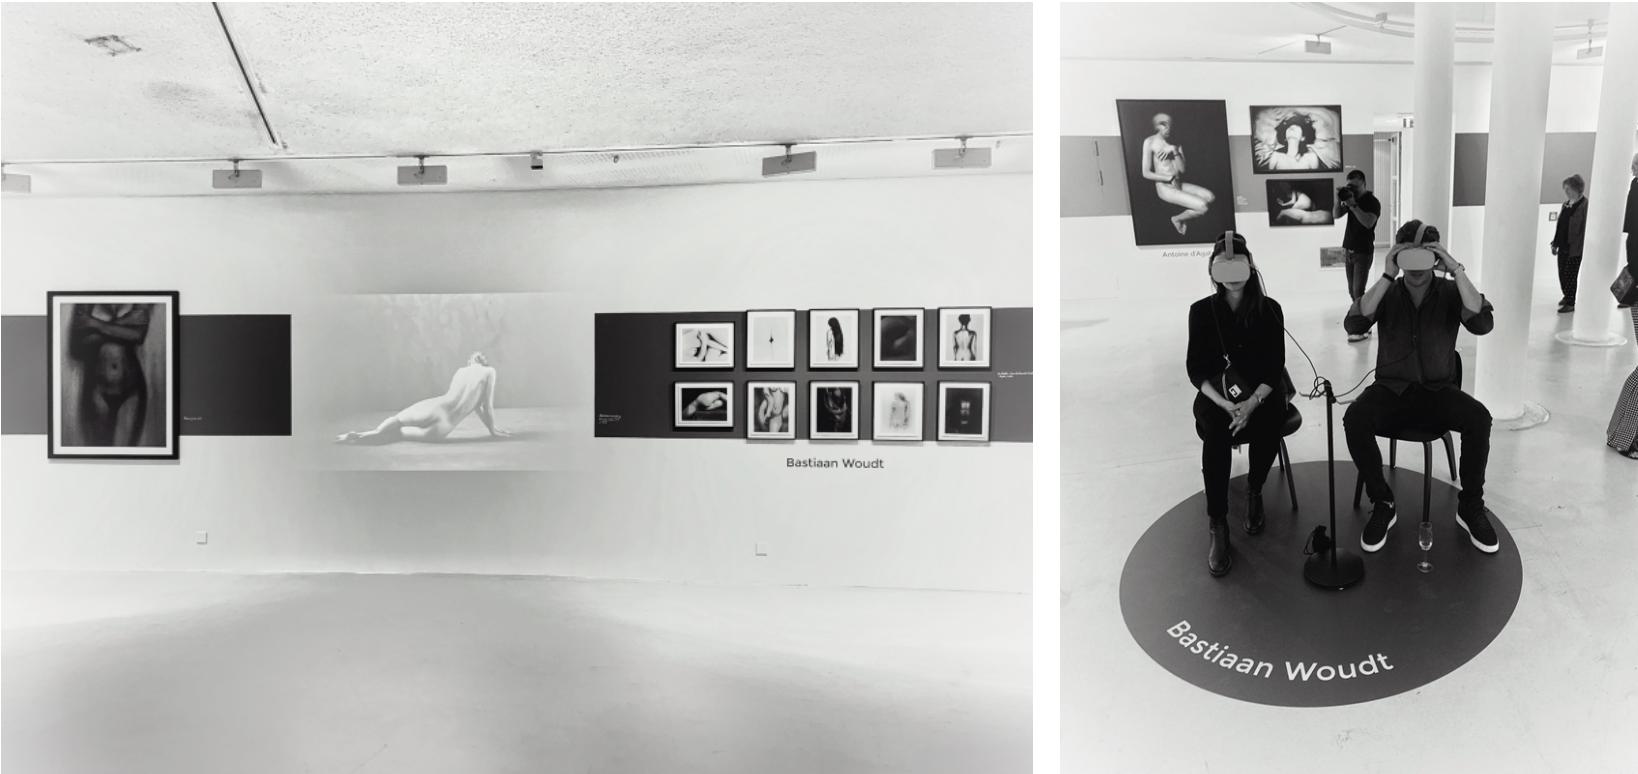 Bastiaan Woudt VR Museum Hilversum